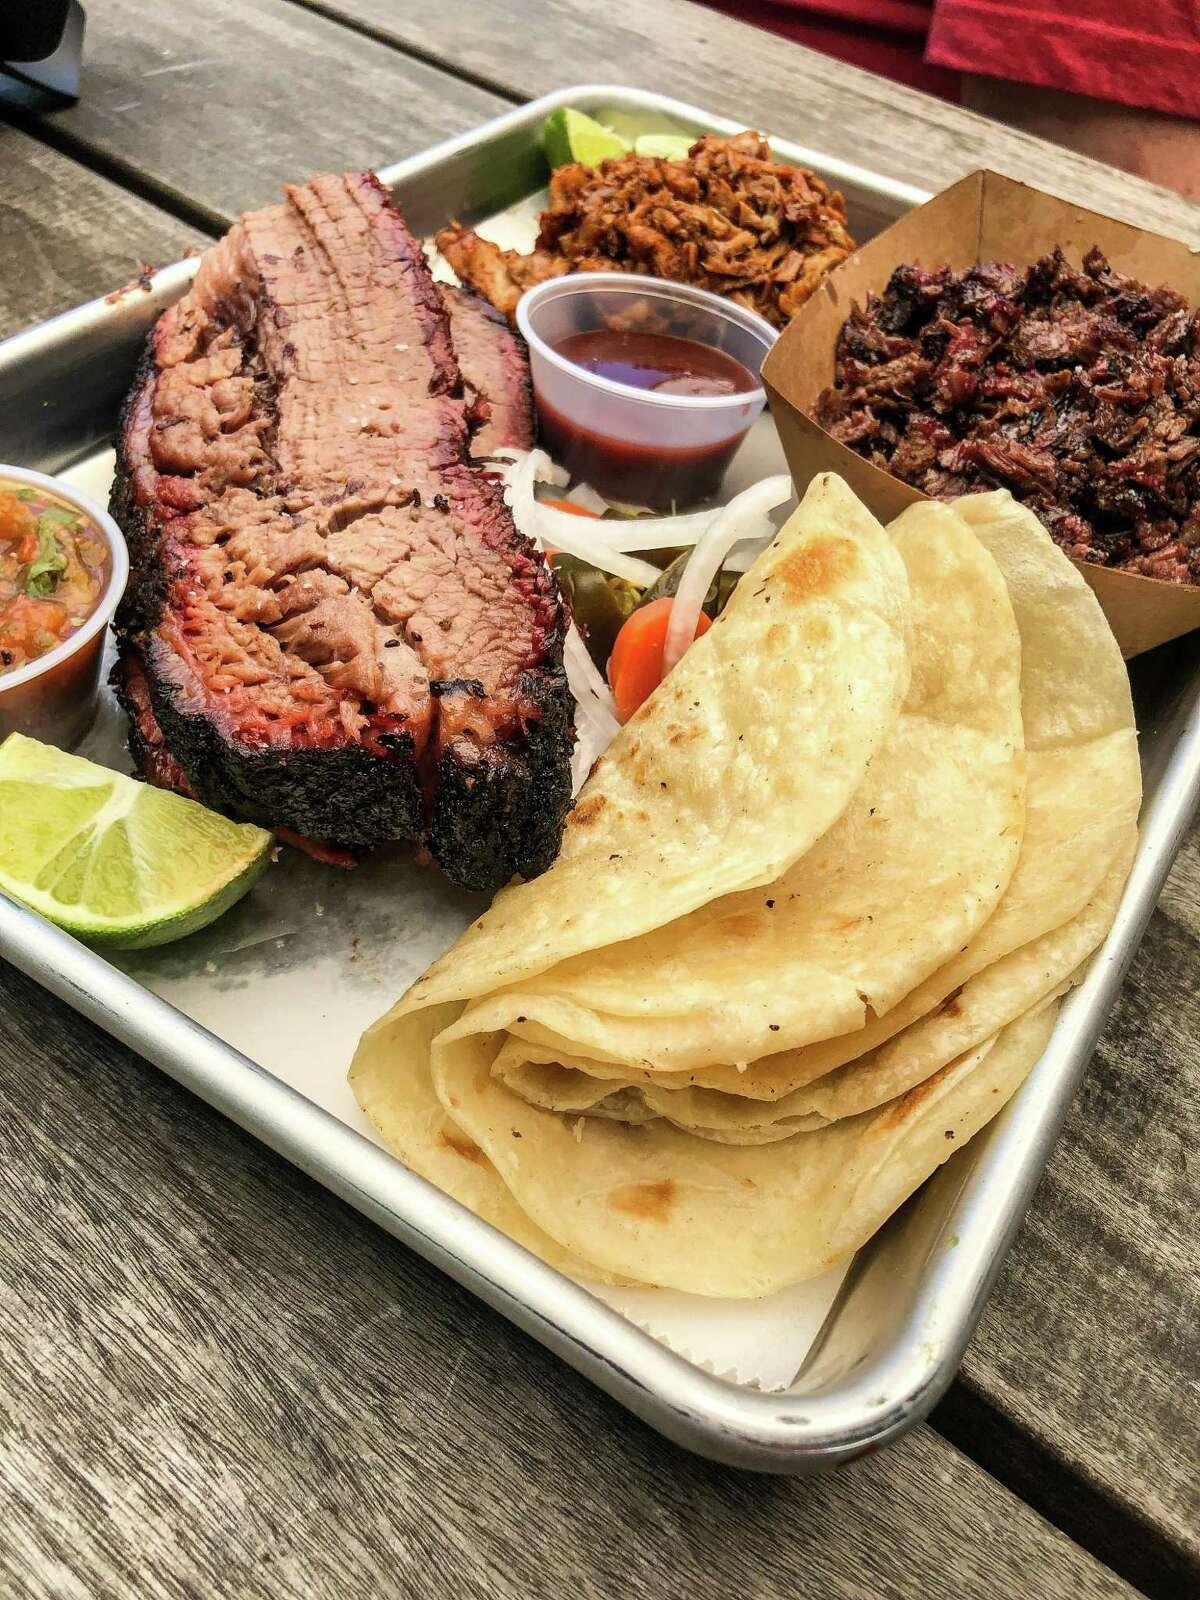 Brisket, barbacoa and flour tortillas at Eddie O's Texas Barbecue pop-up at D&T Drive Inn